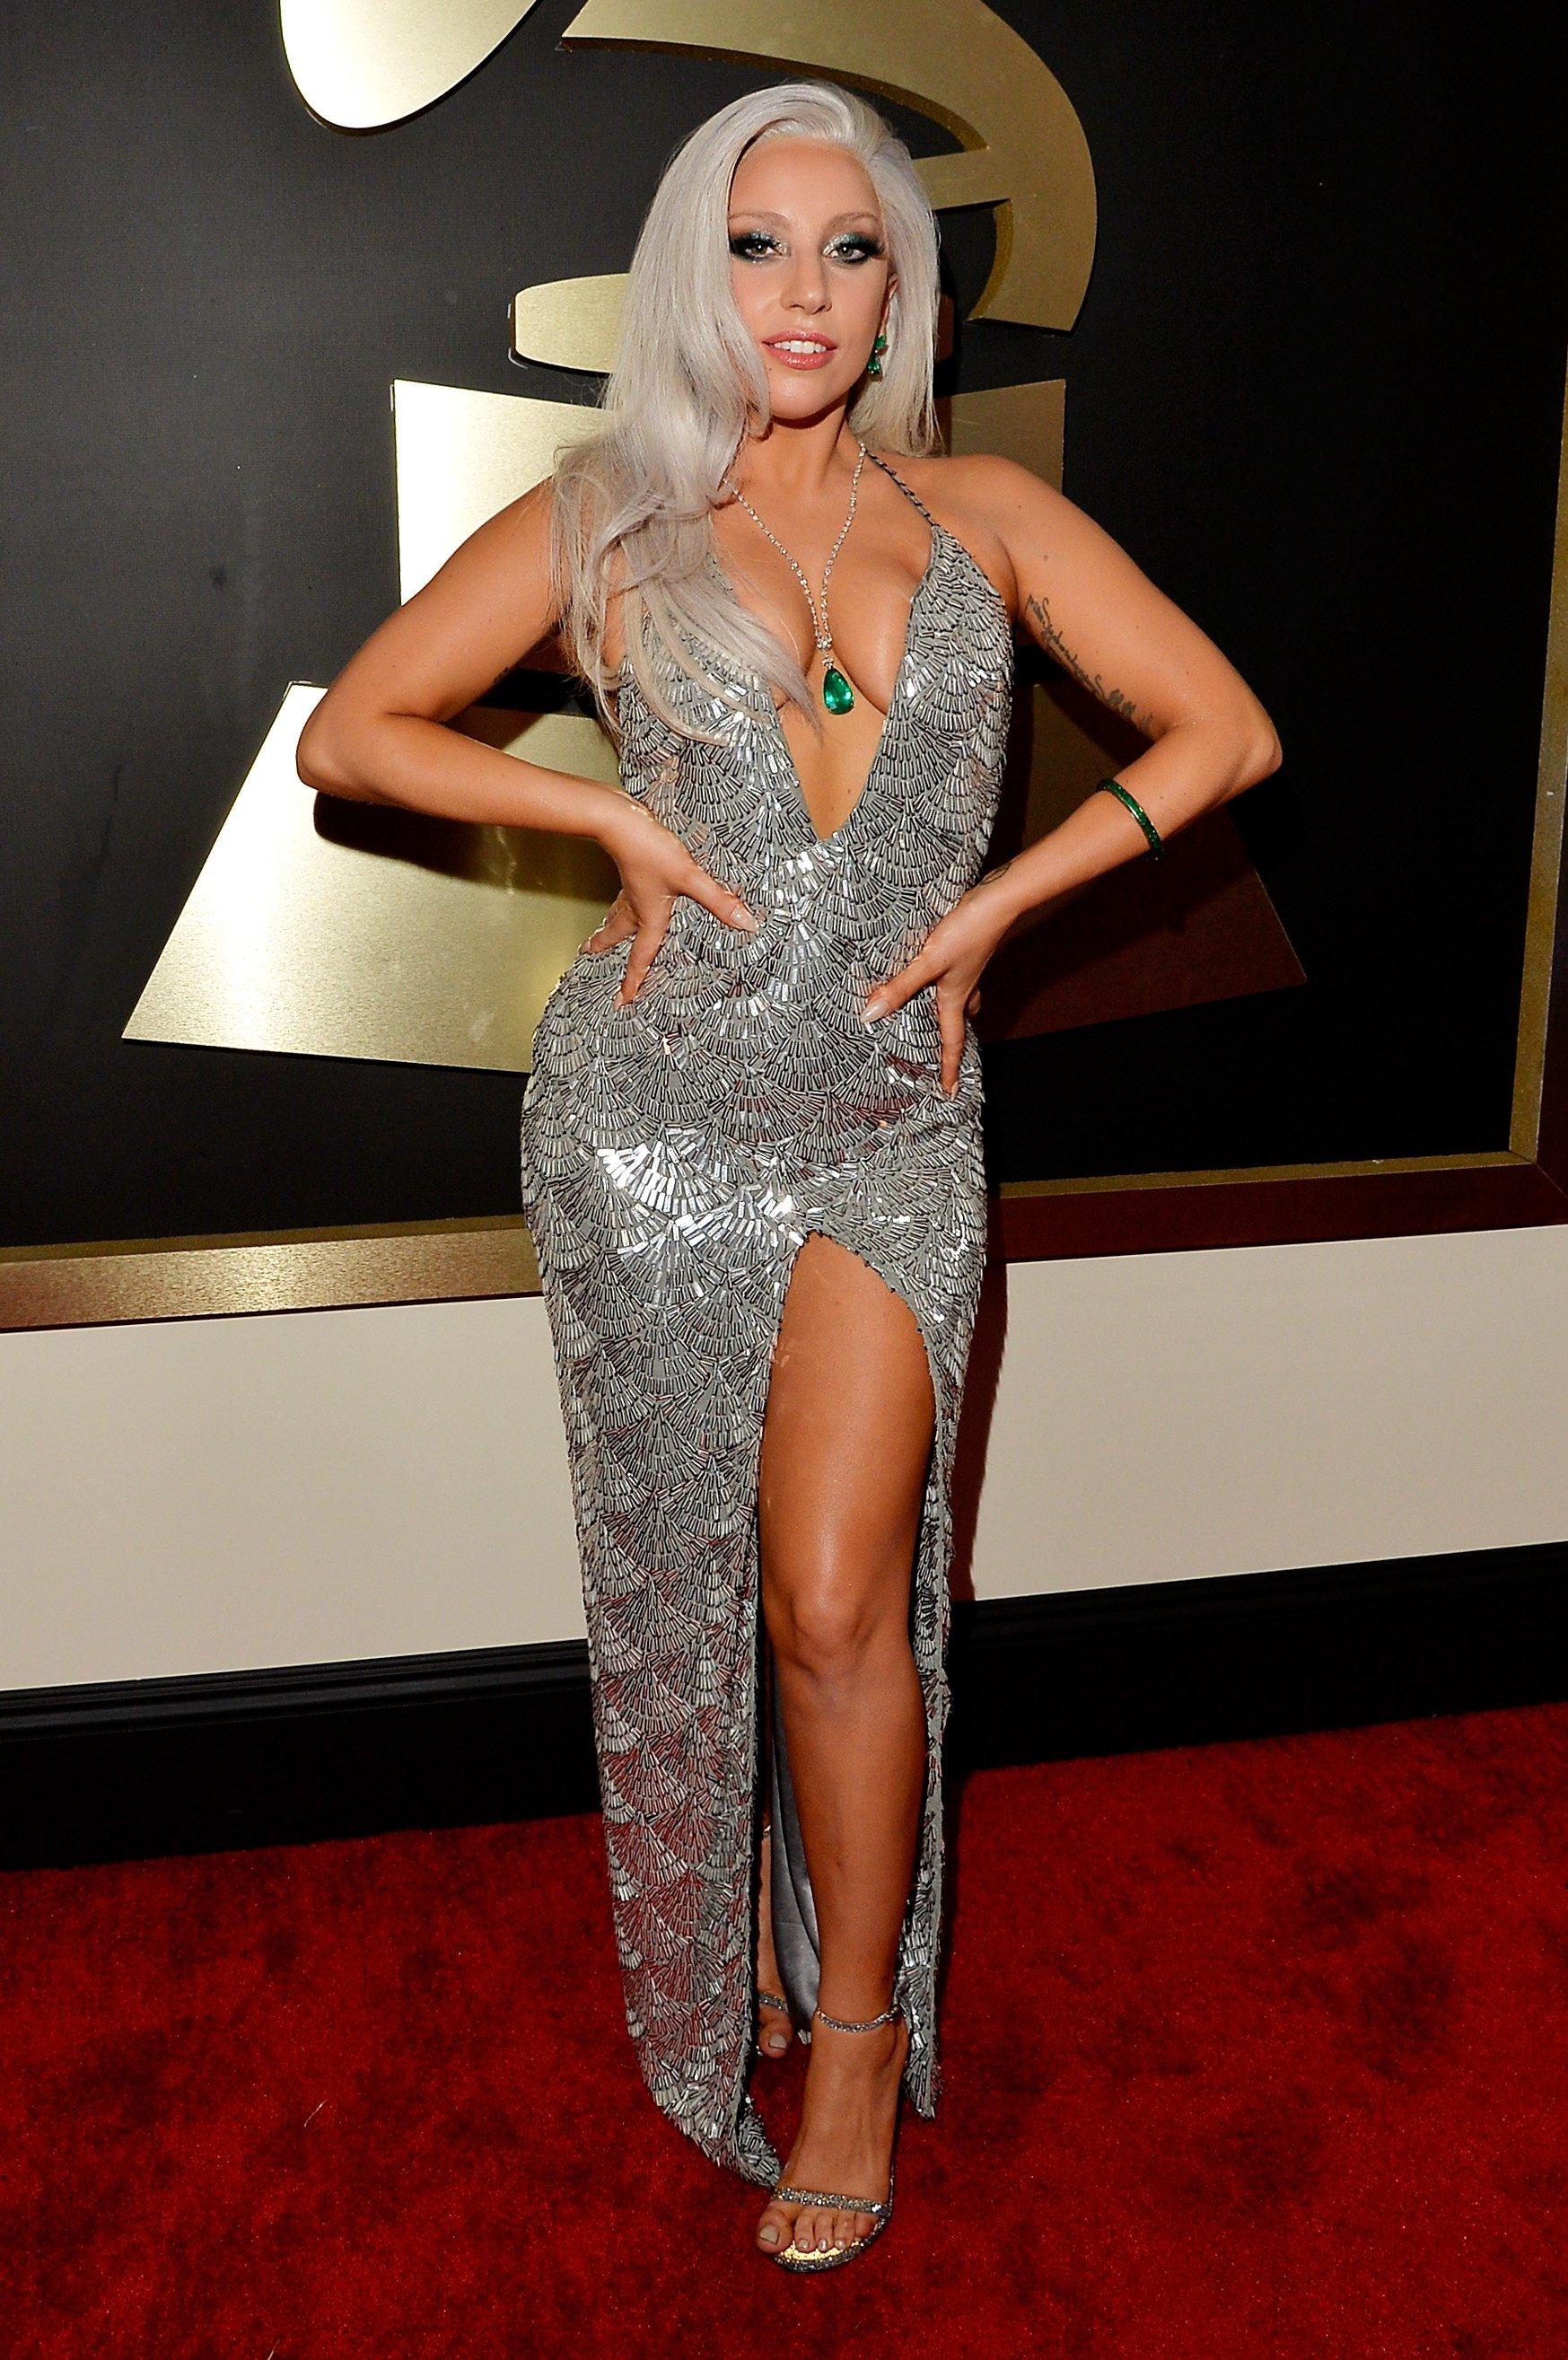 Lady Gaga Pics, Music Collection